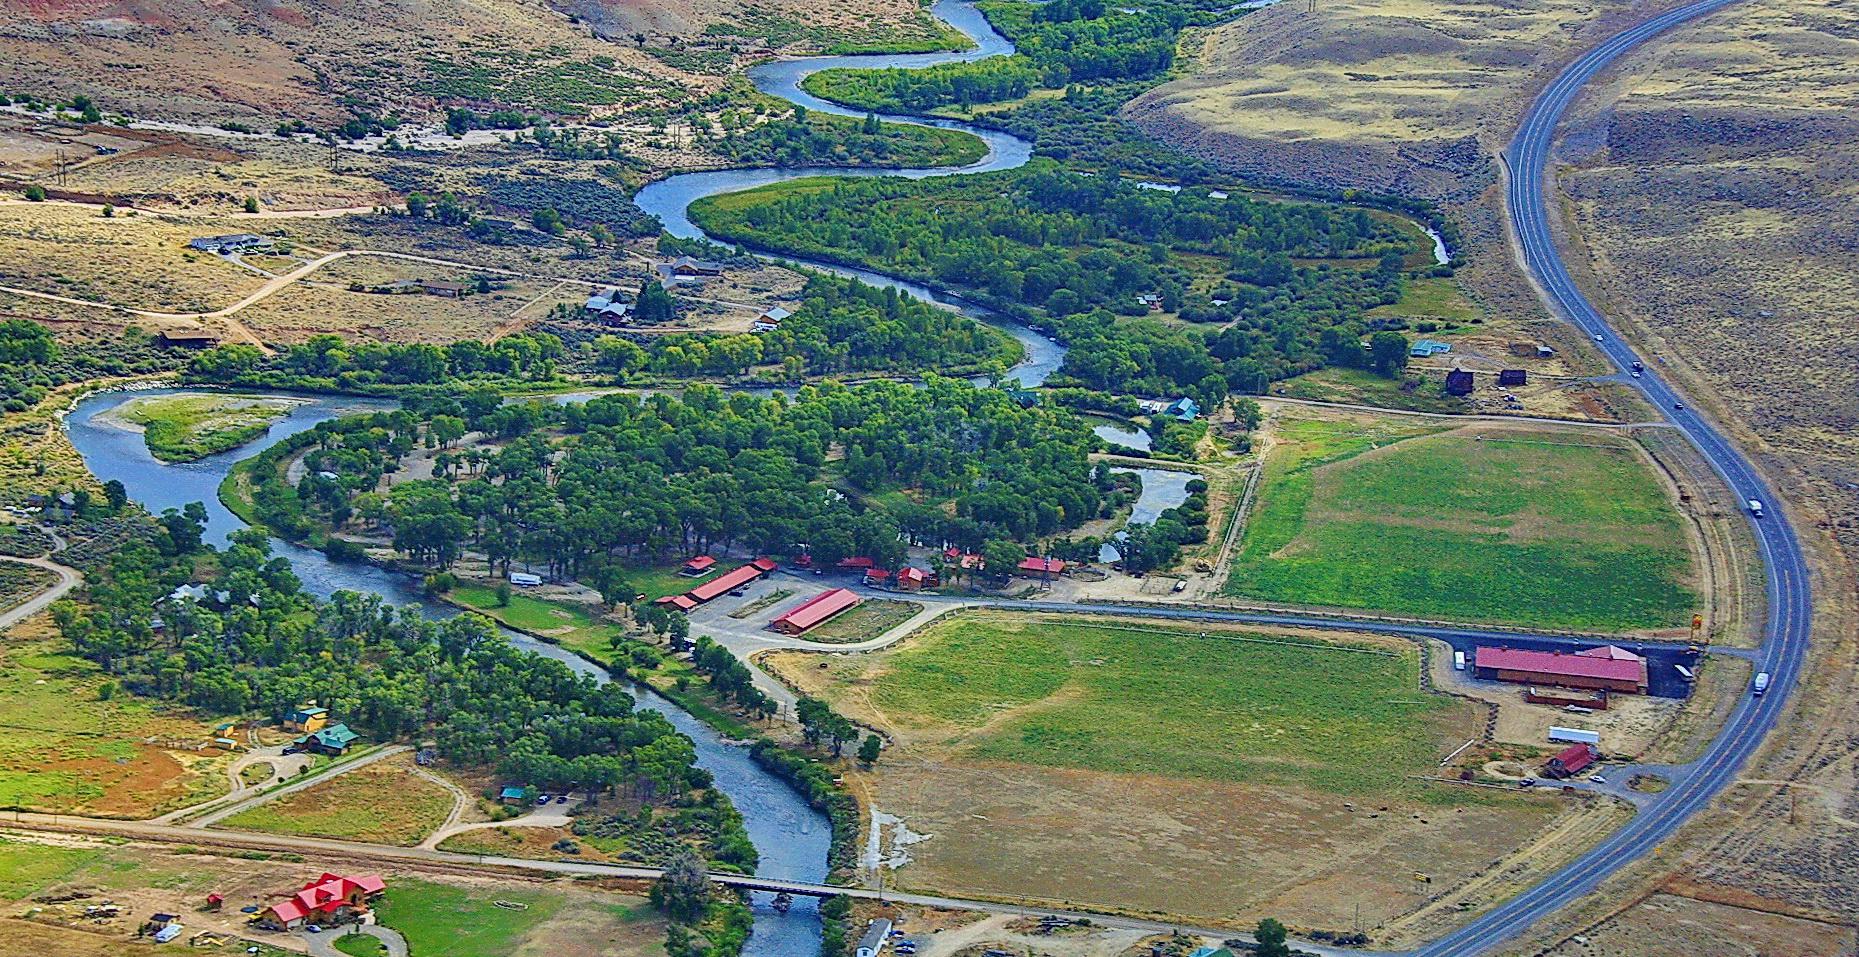 The Longhorn Ranch Lodge & RV Resort